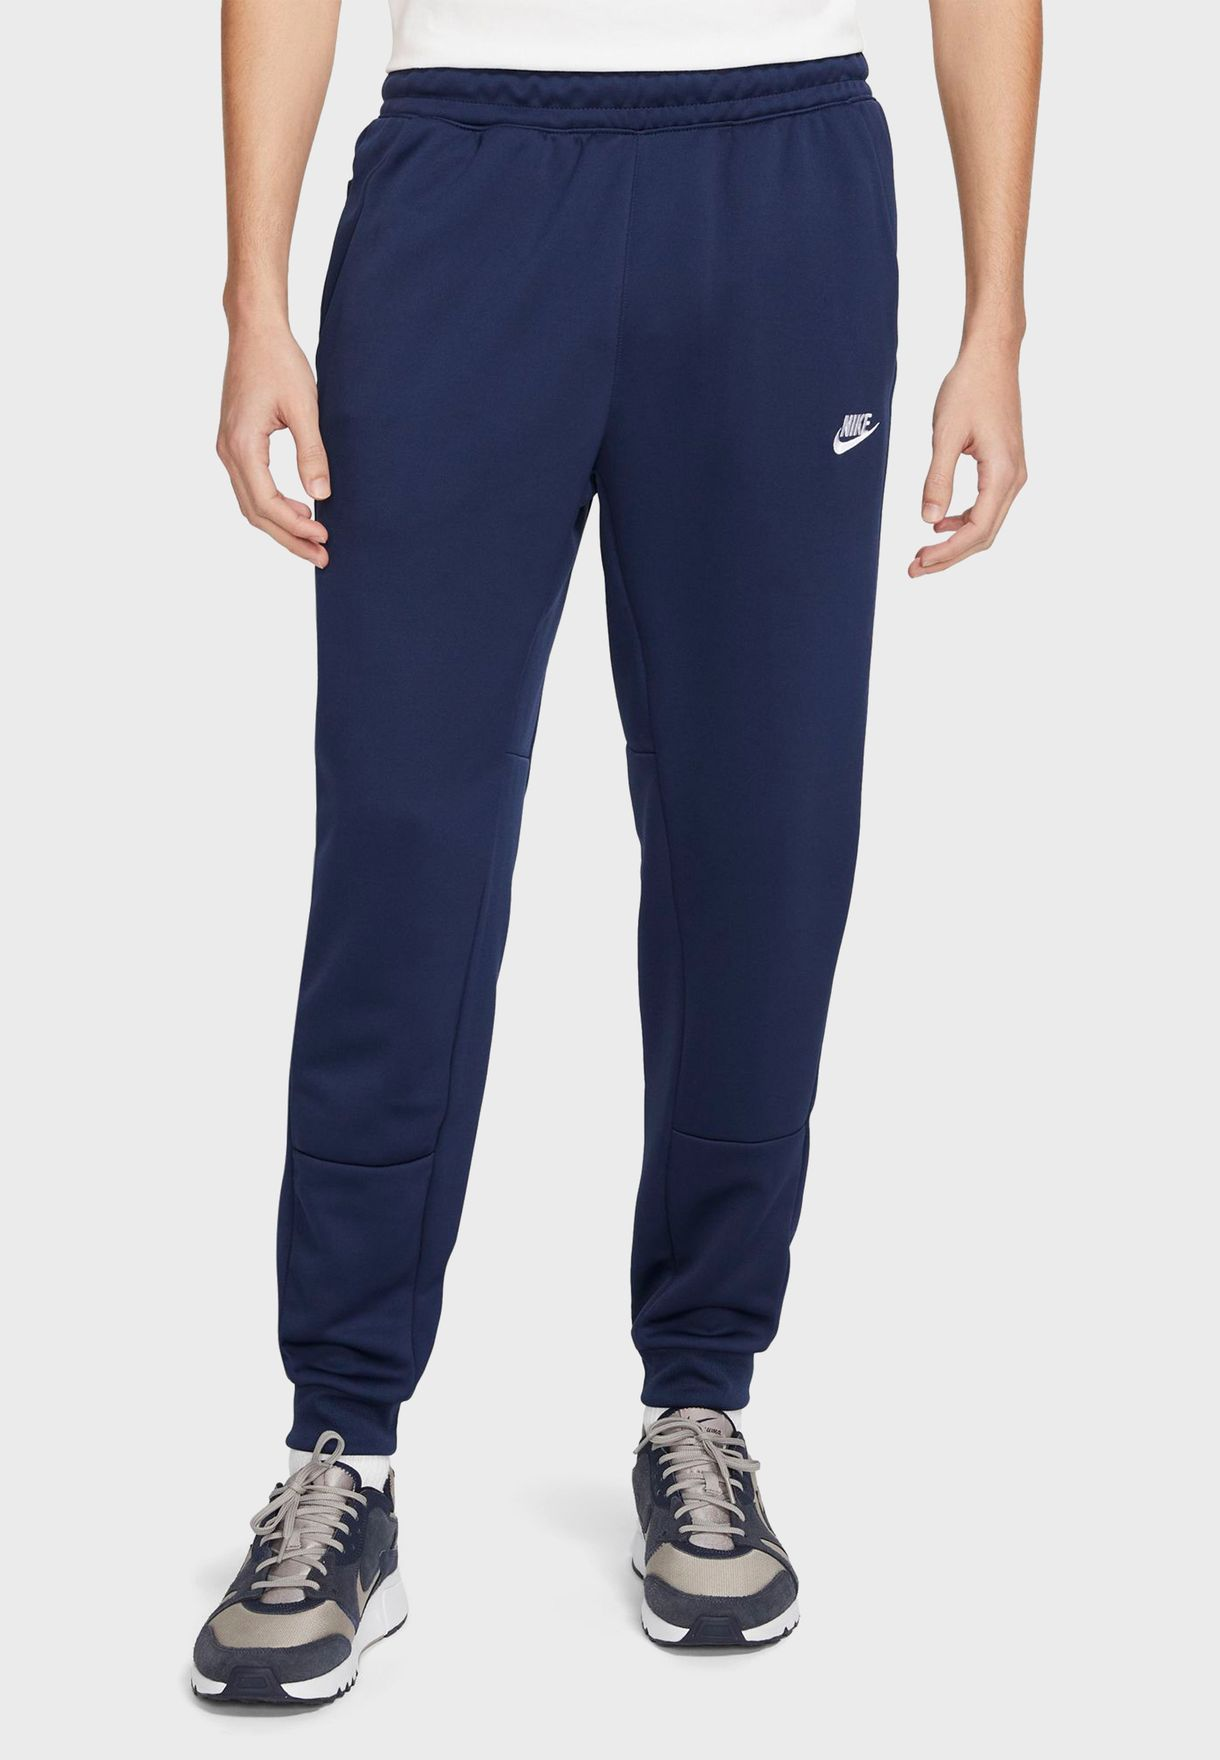 NSW Tribute Sweatpants